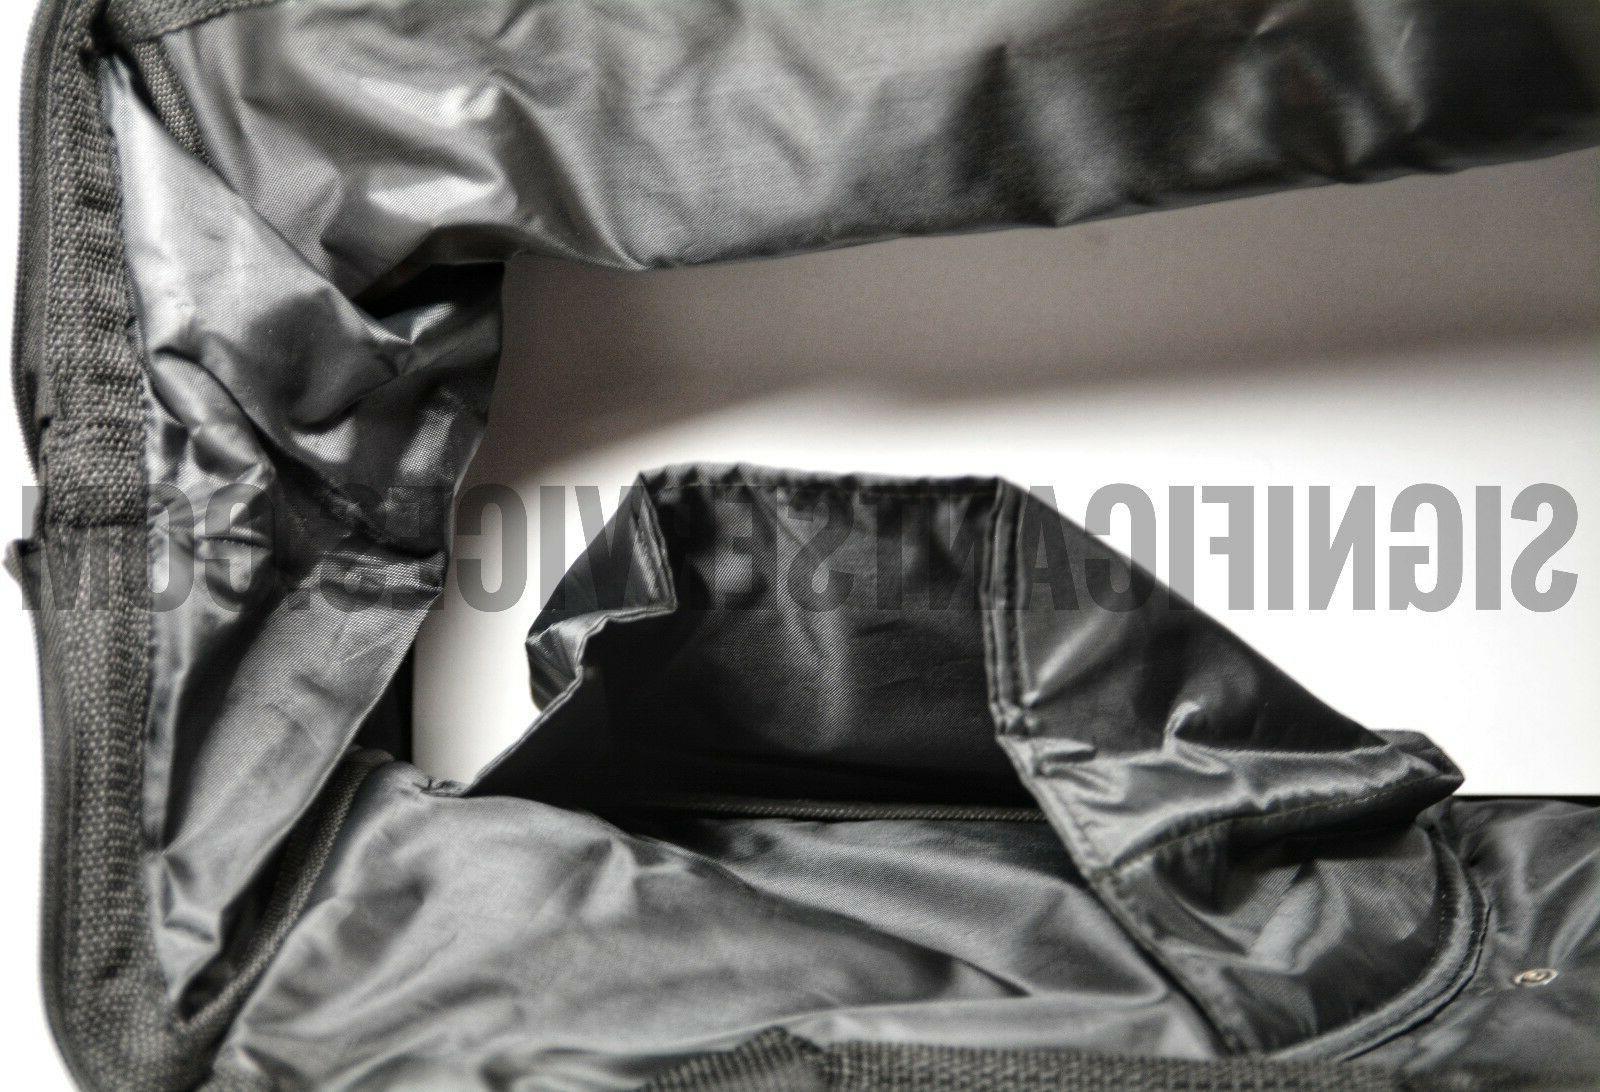 New Heavy Contractor Pocket Tool Bag Case